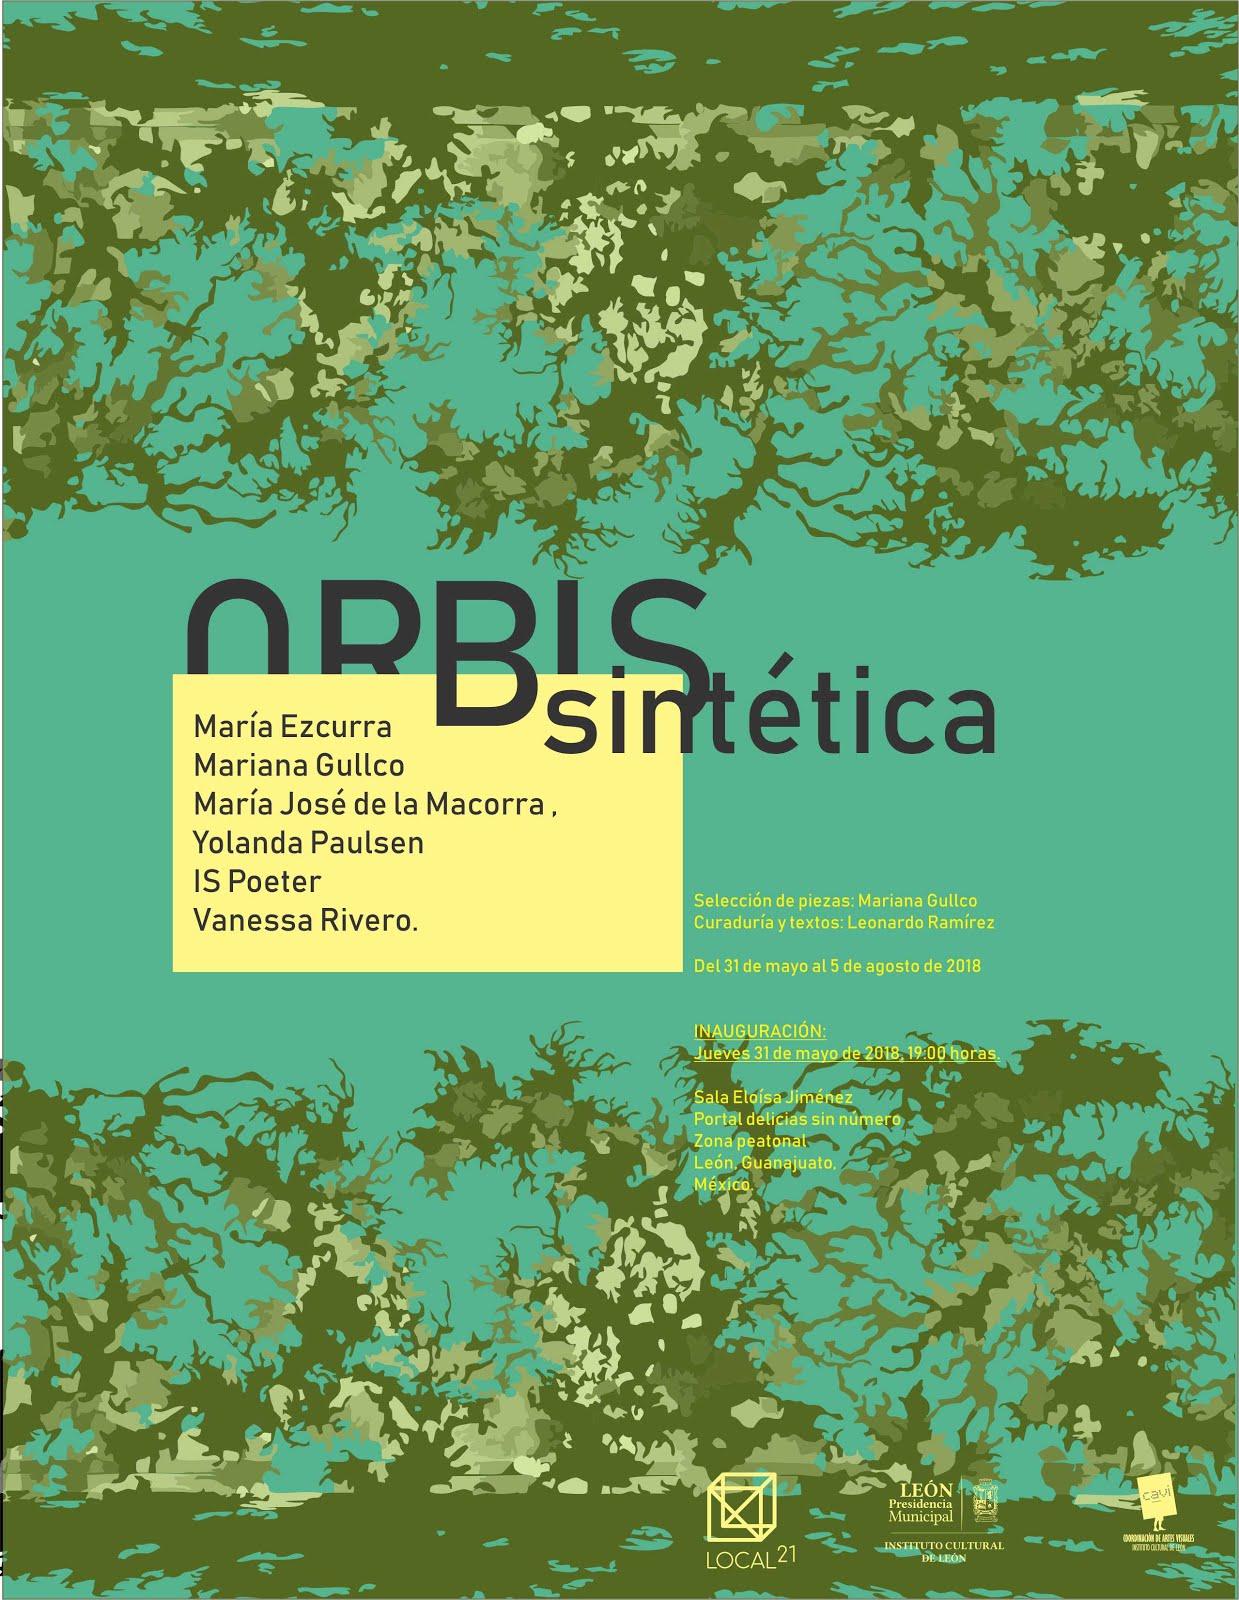 Orbis Sintética